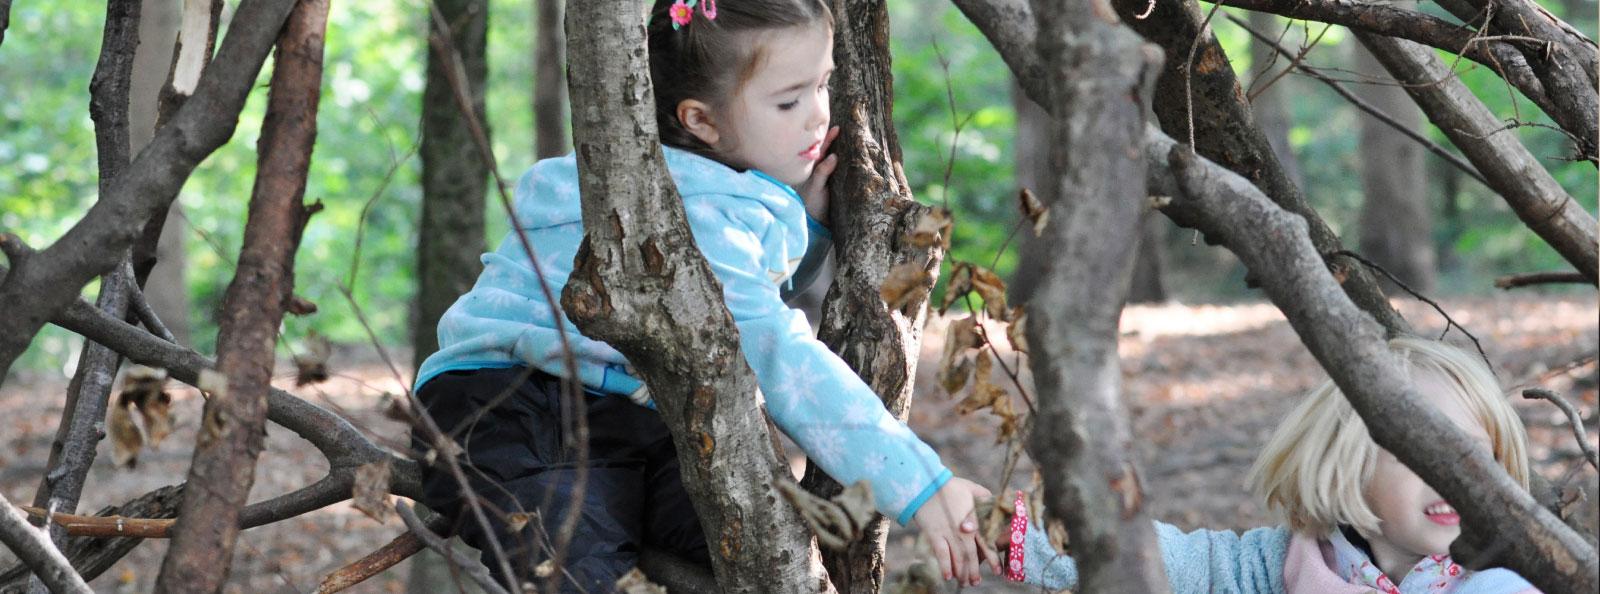 https://www.four-forestschool.ch/uploads/images/headerimage/sitemap.jpg